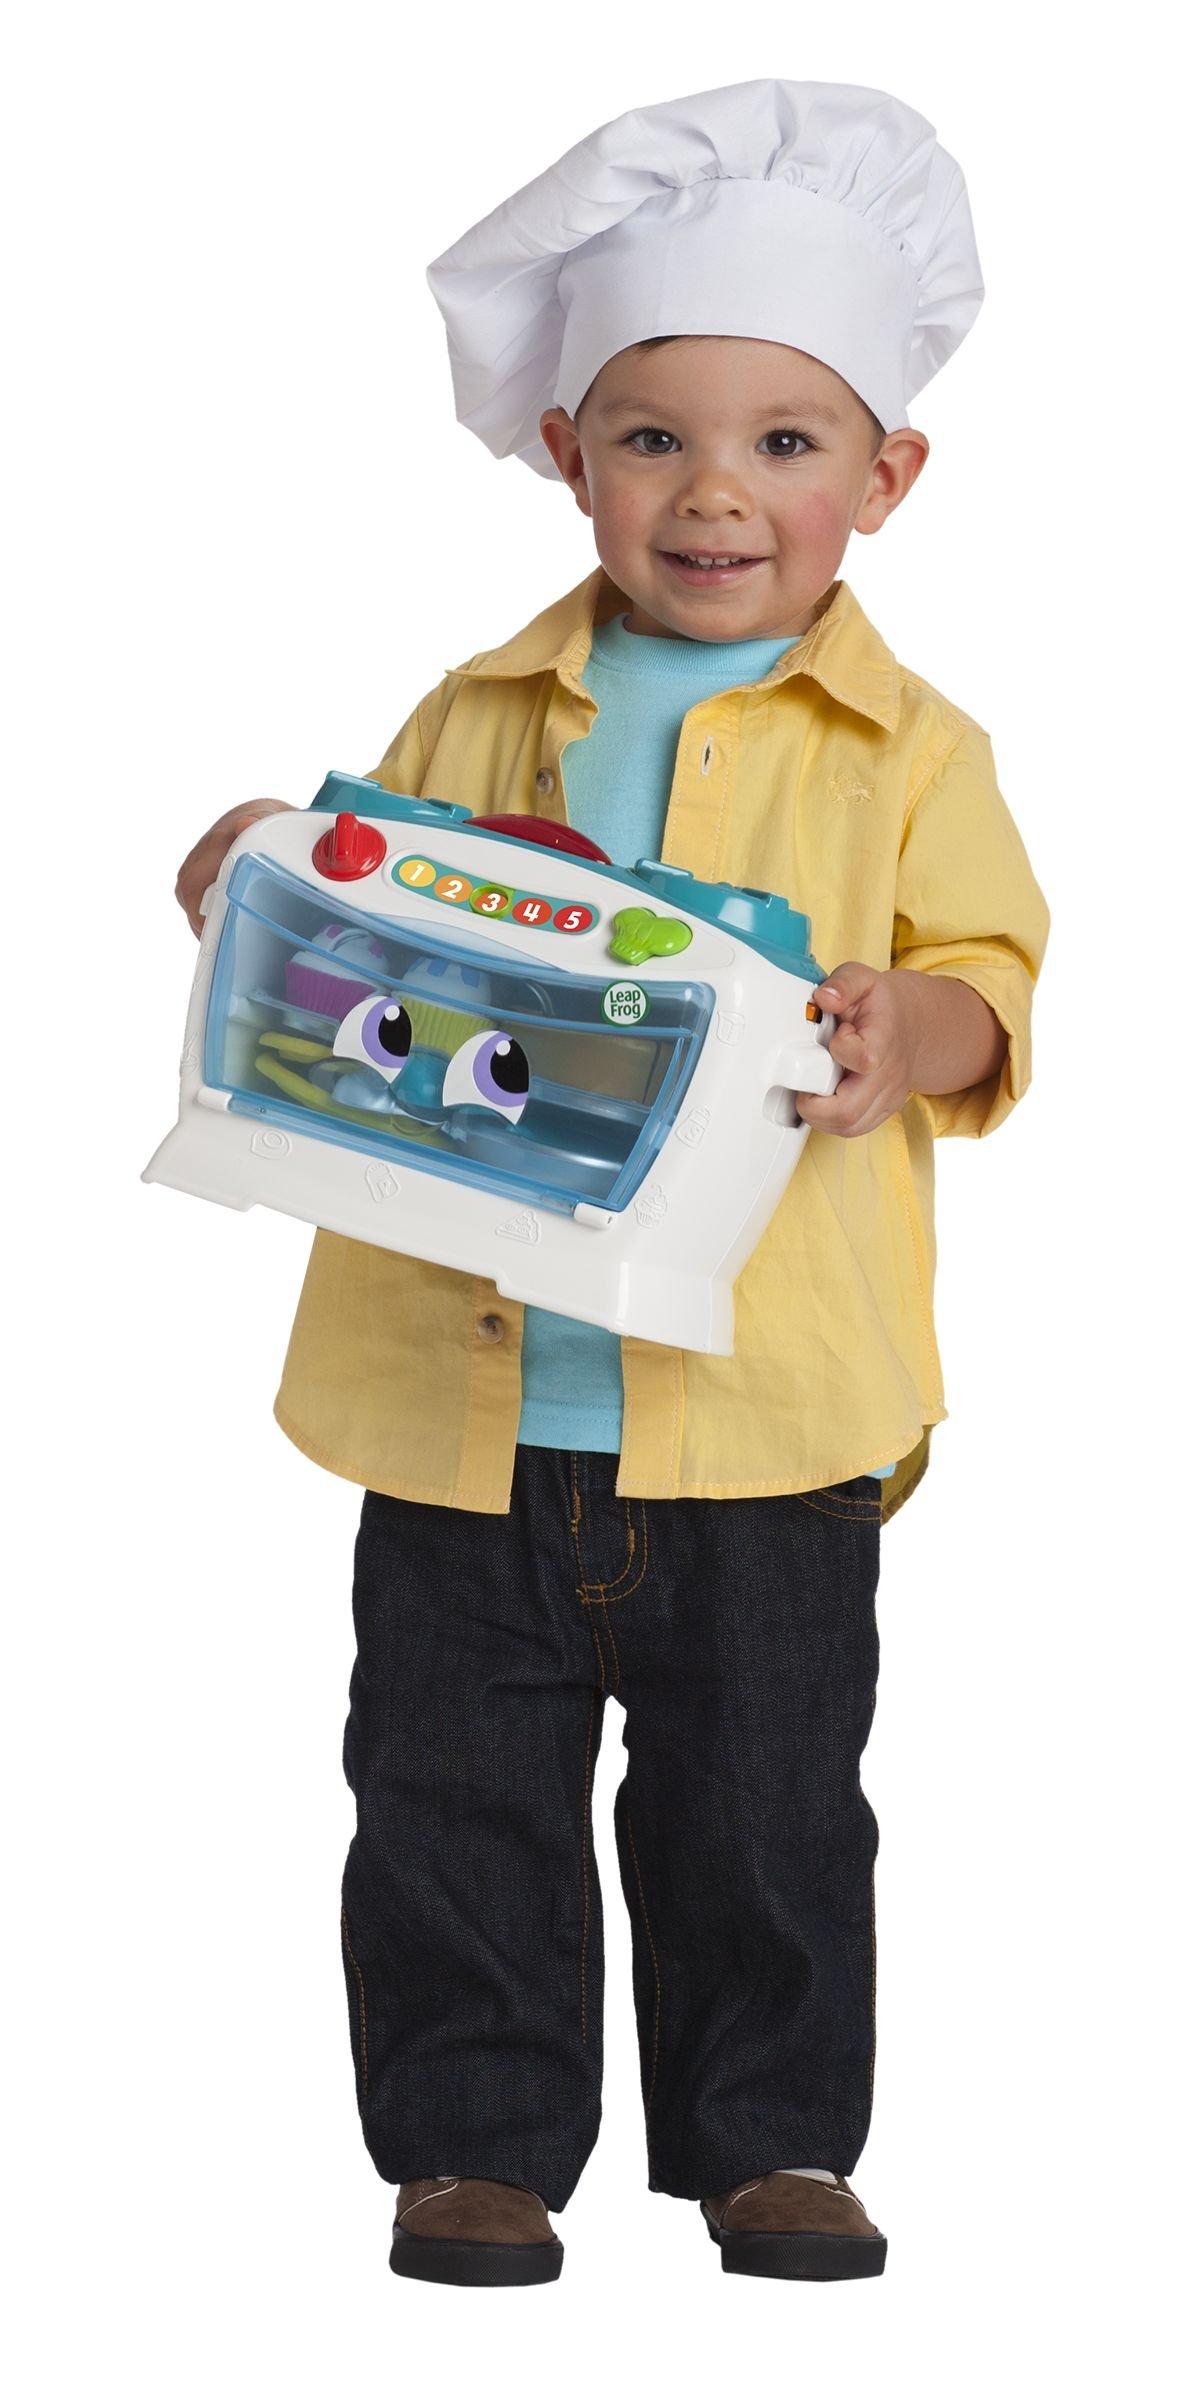 LeapFrog Number Lovin' Oven (Frustration Free Packaging) by LeapFrog (Image #5)